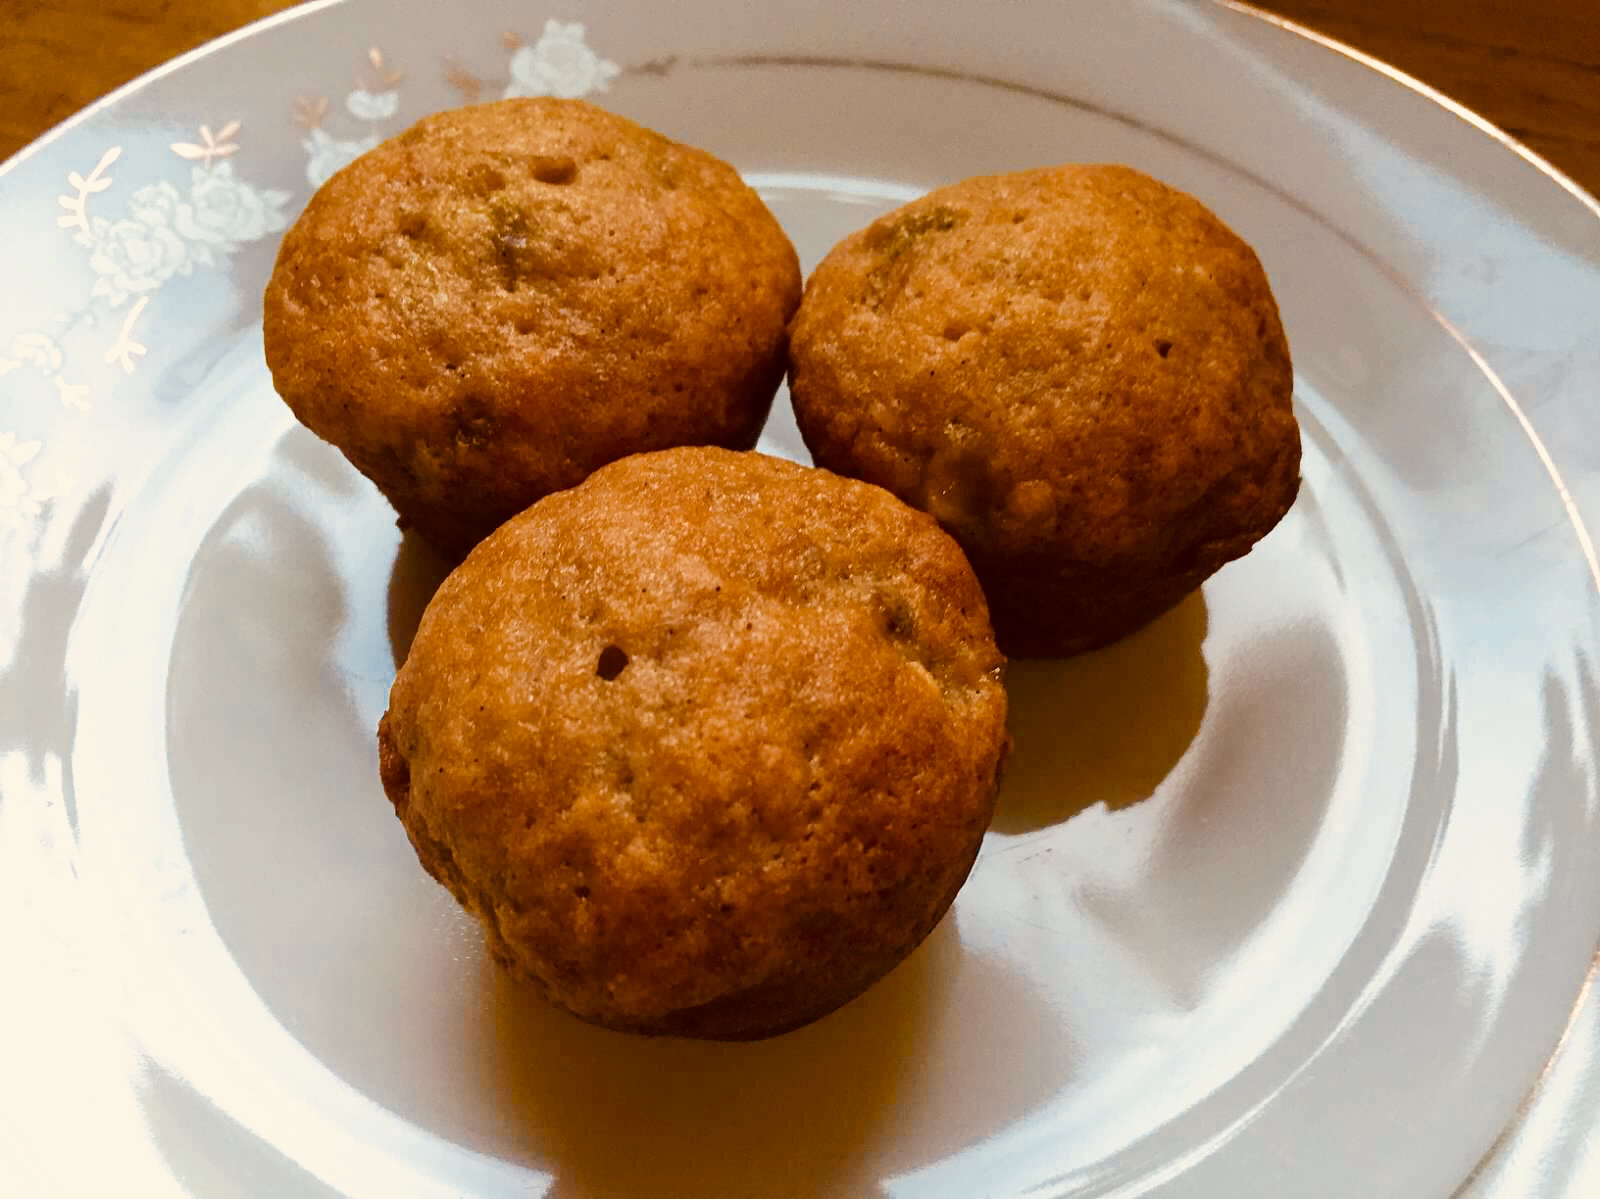 Golden Raisin Carrot Cake Mini Muffins (No Nuts) from Alexandersmom.com